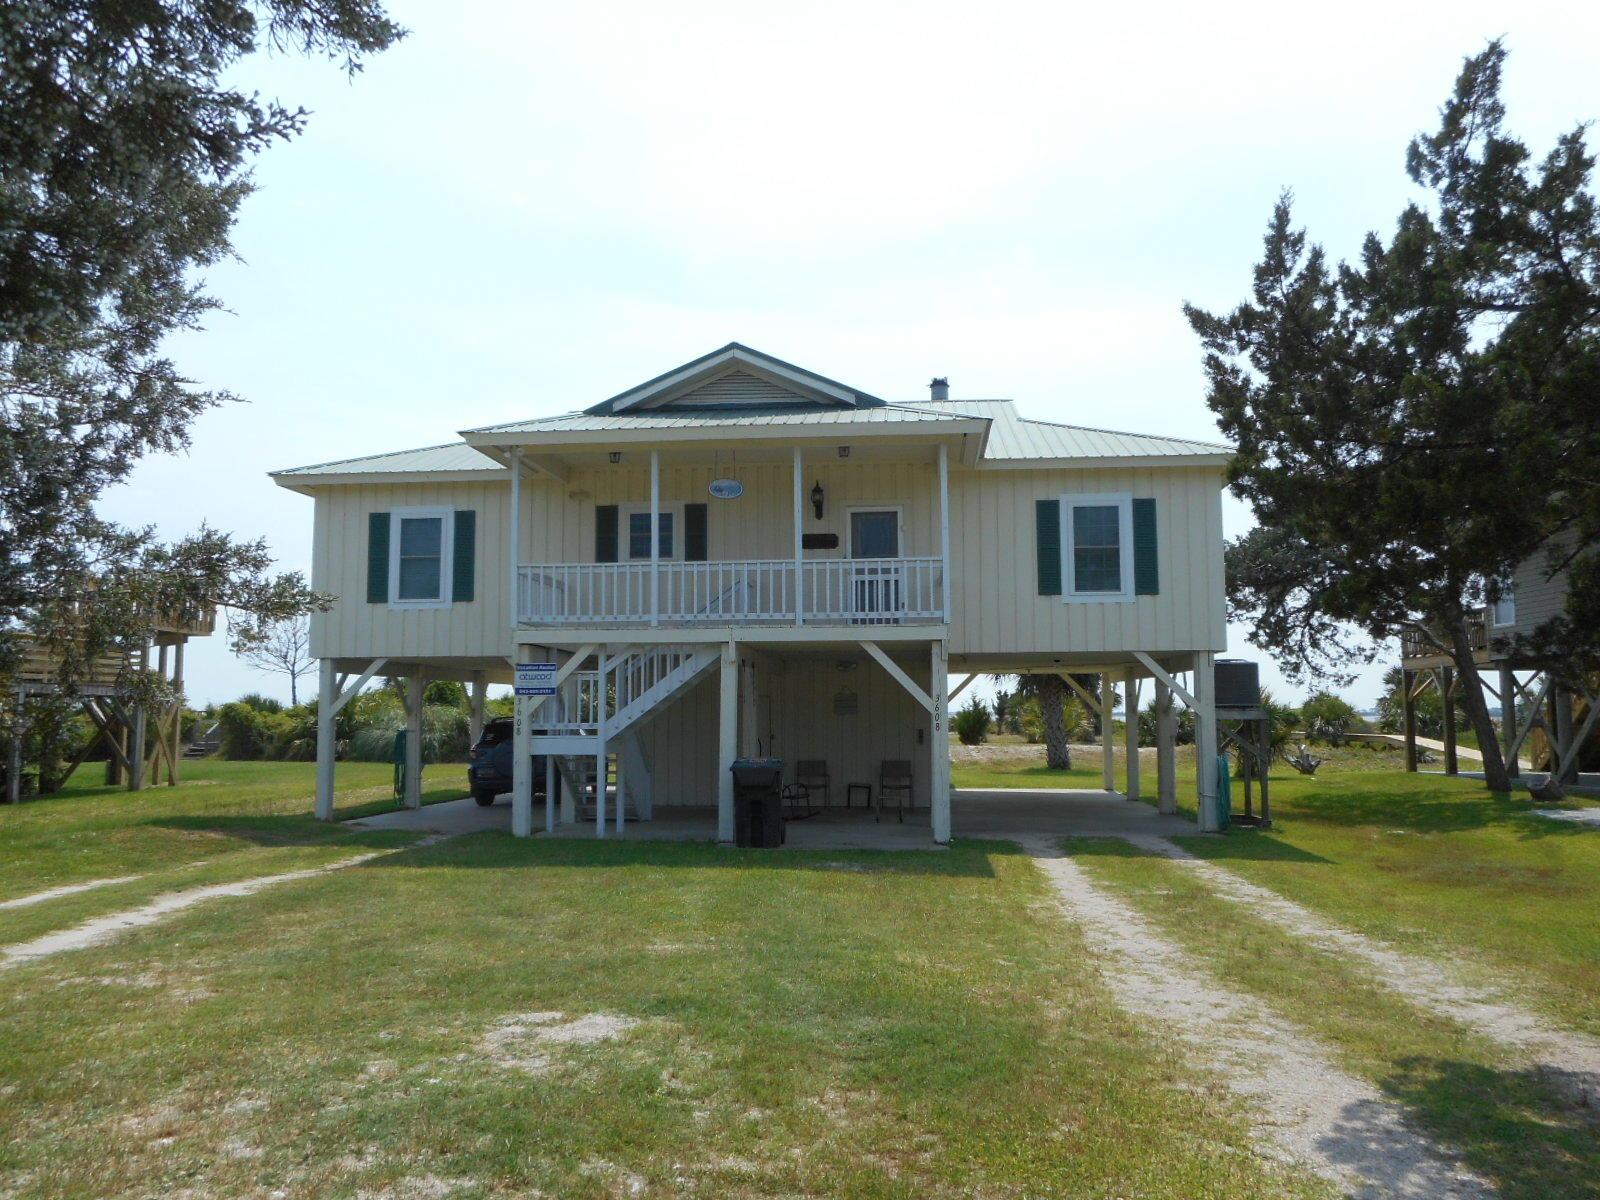 Beachfront Homes For Sale - 3608 Yacht Club, Edisto Beach, SC - 29